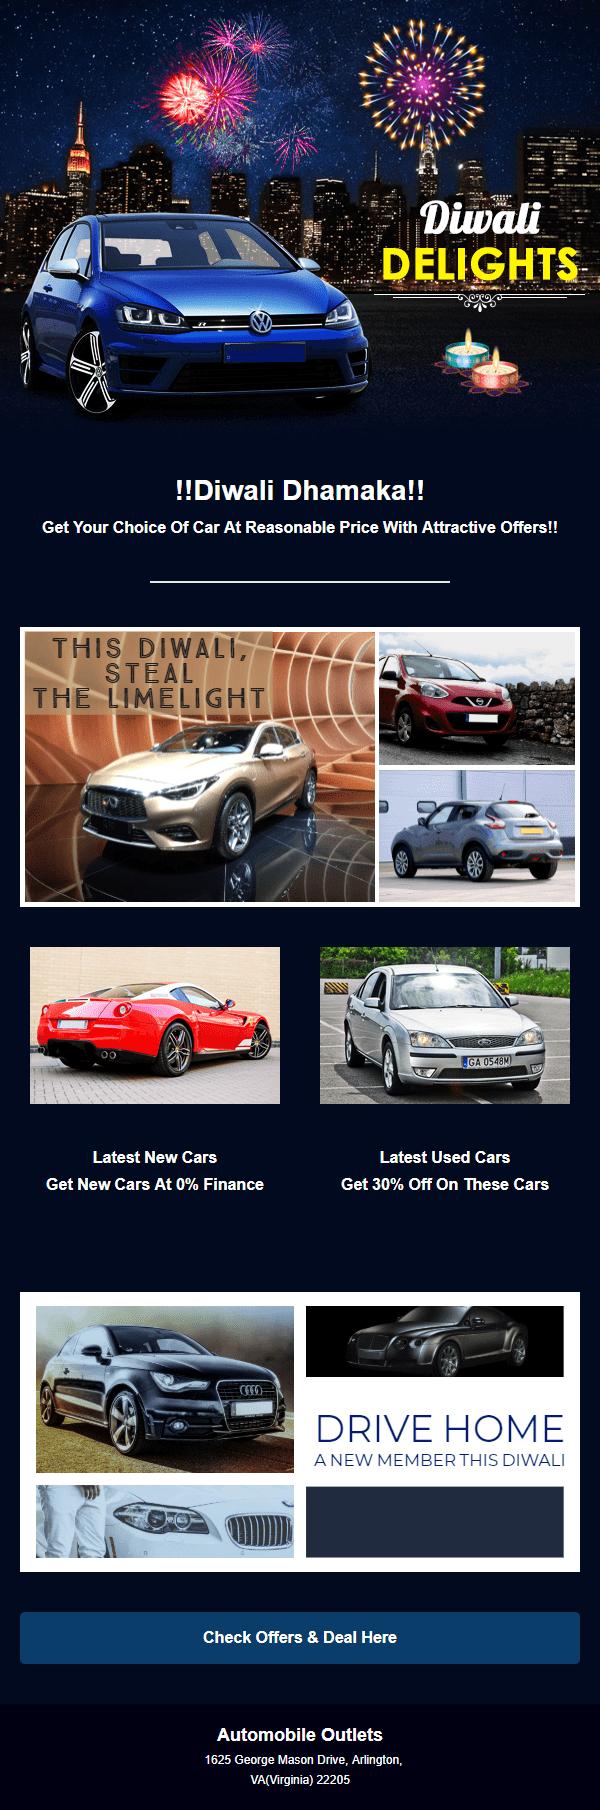 Automobile content image